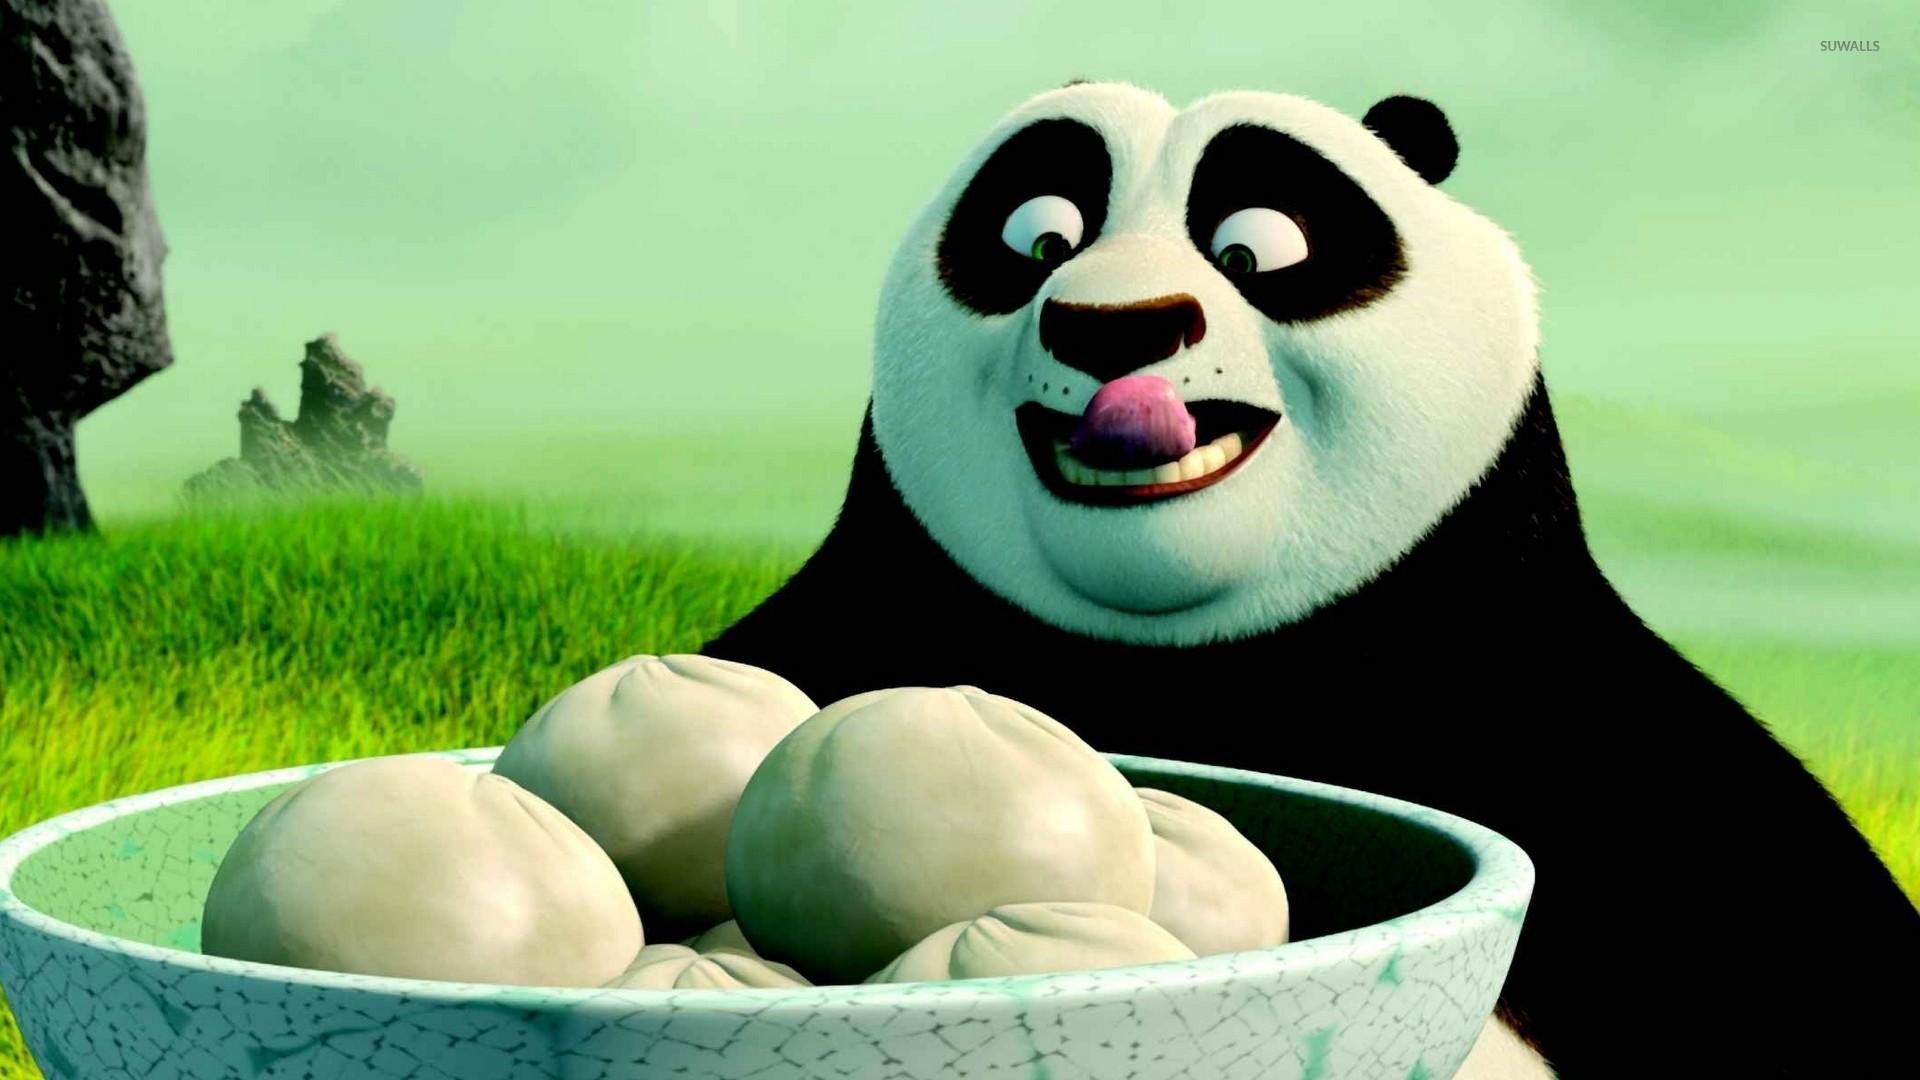 Res: 1920x1080, Po having dumplings - Kung Fu Panda wallpaper